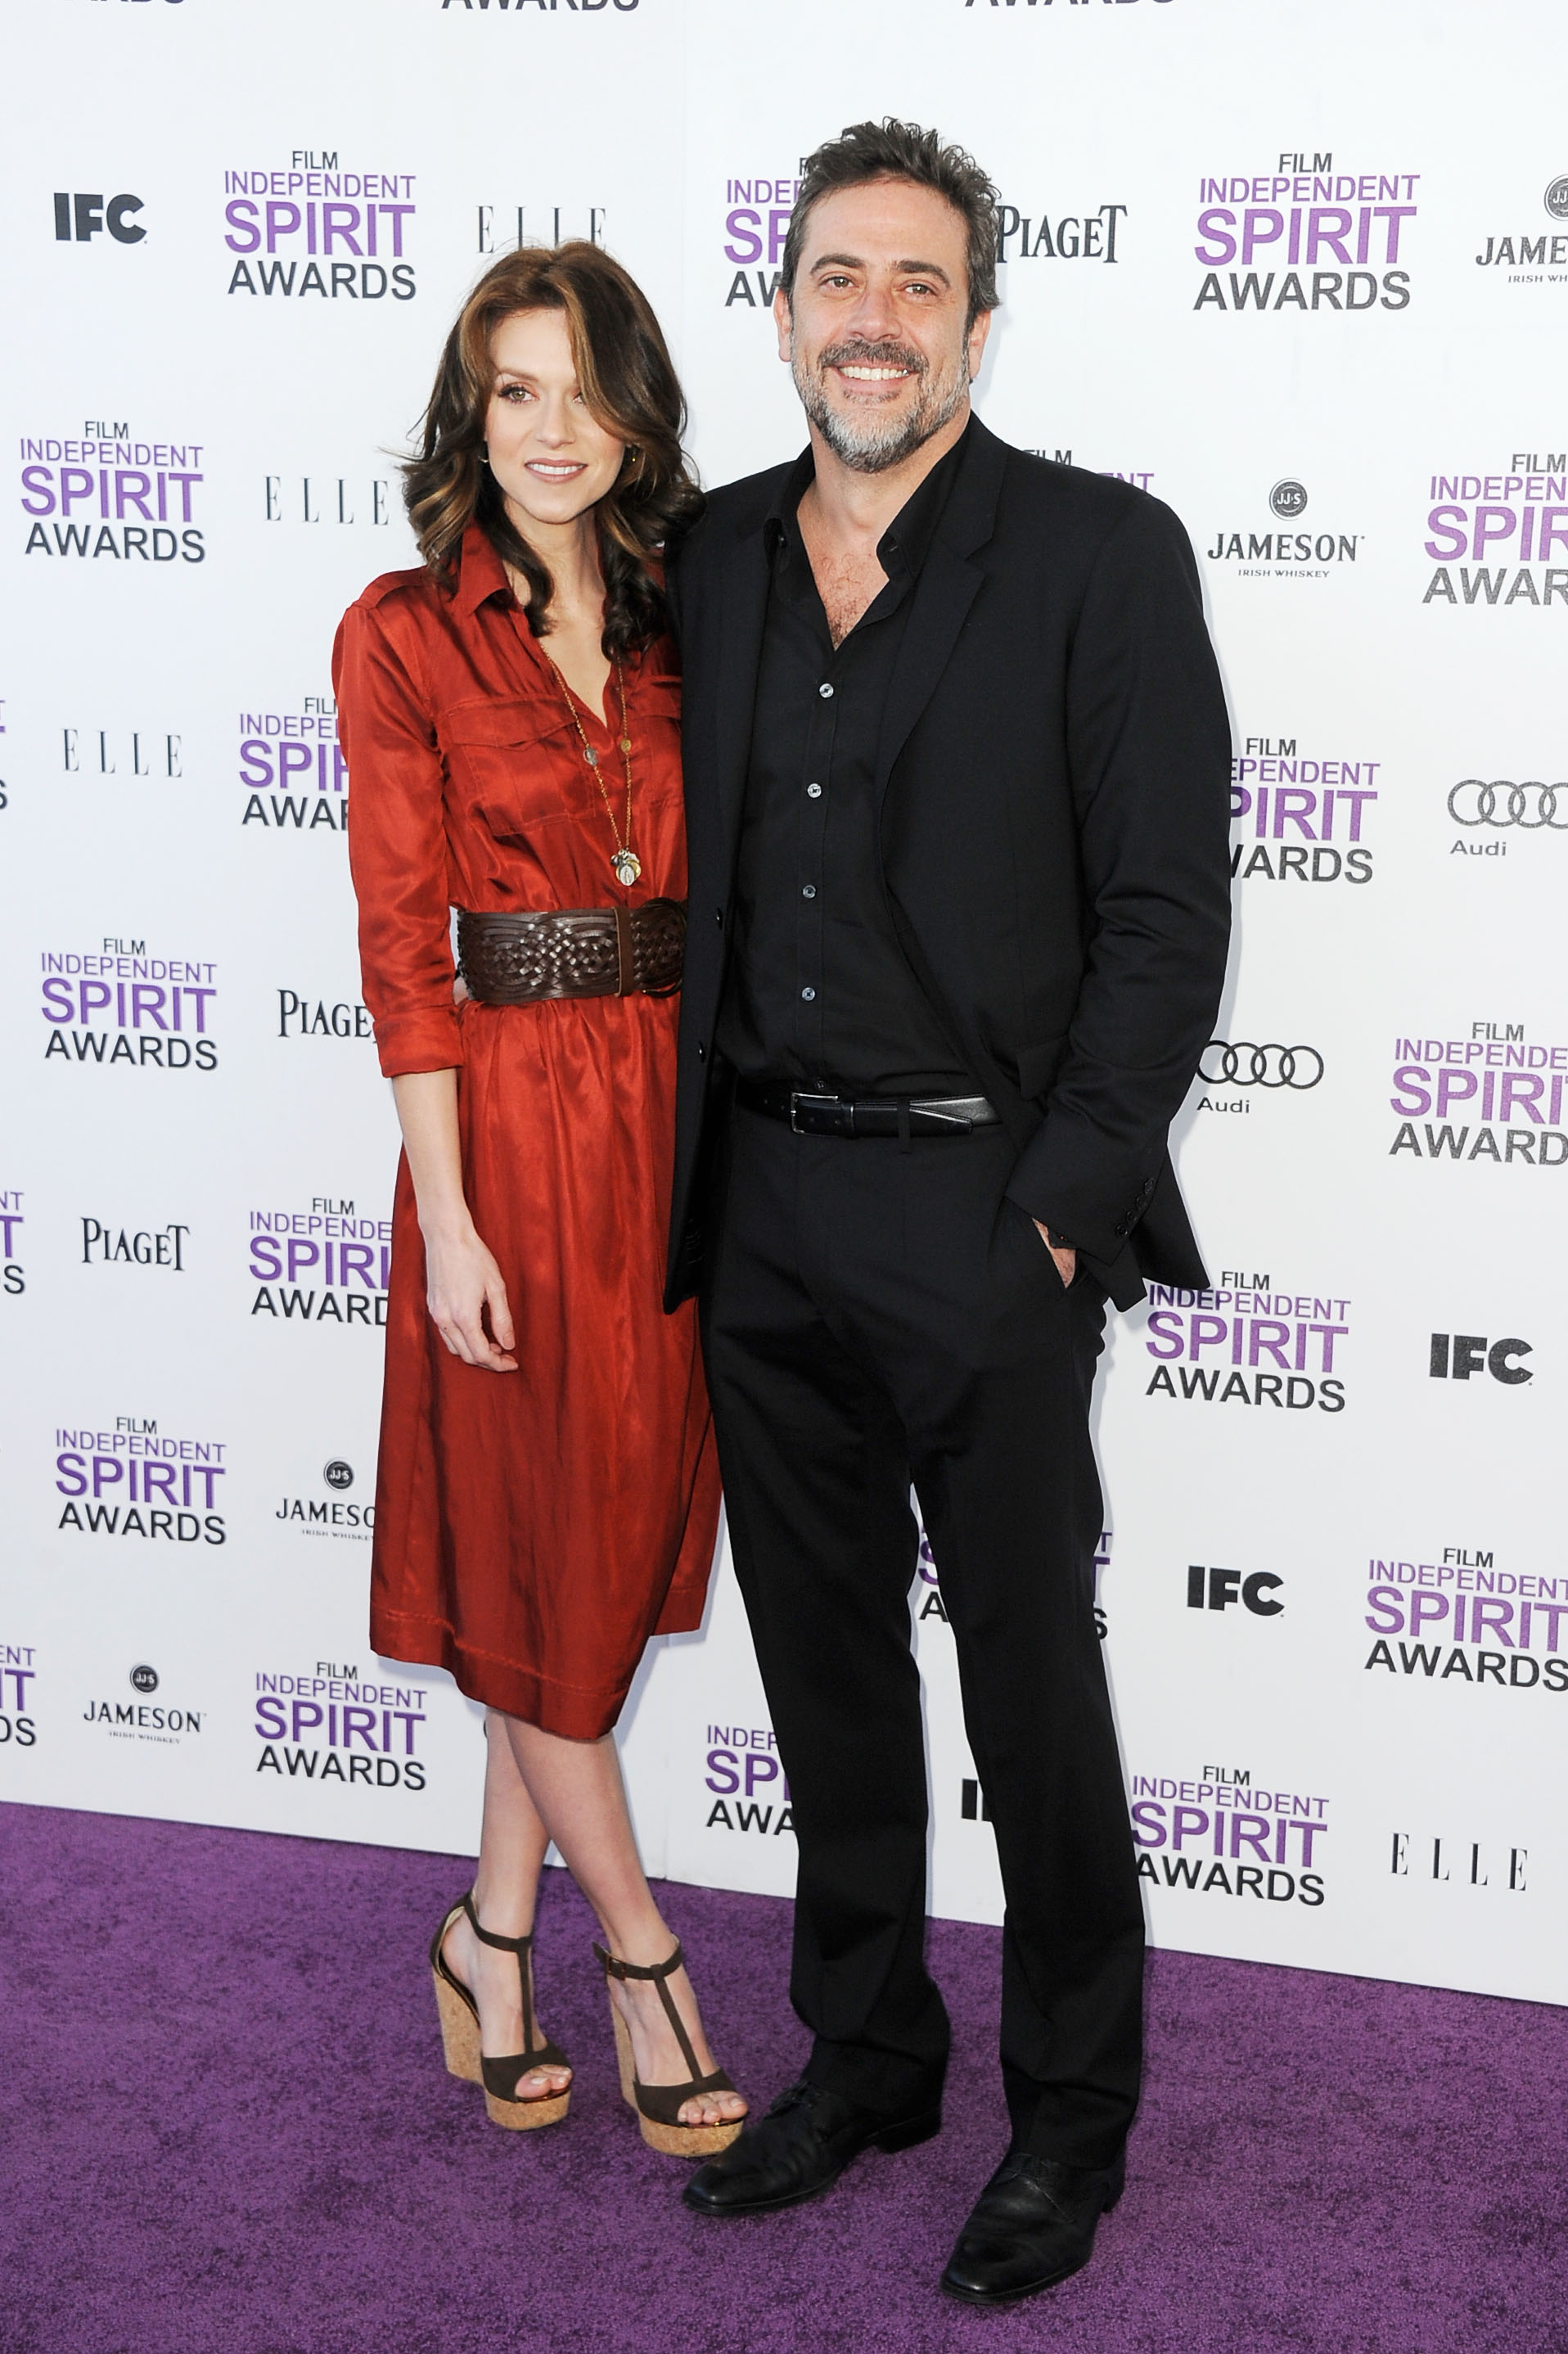 351301141_Film_Independent_Spirit_Awards_Feb_25_8_122_576lo.jpg